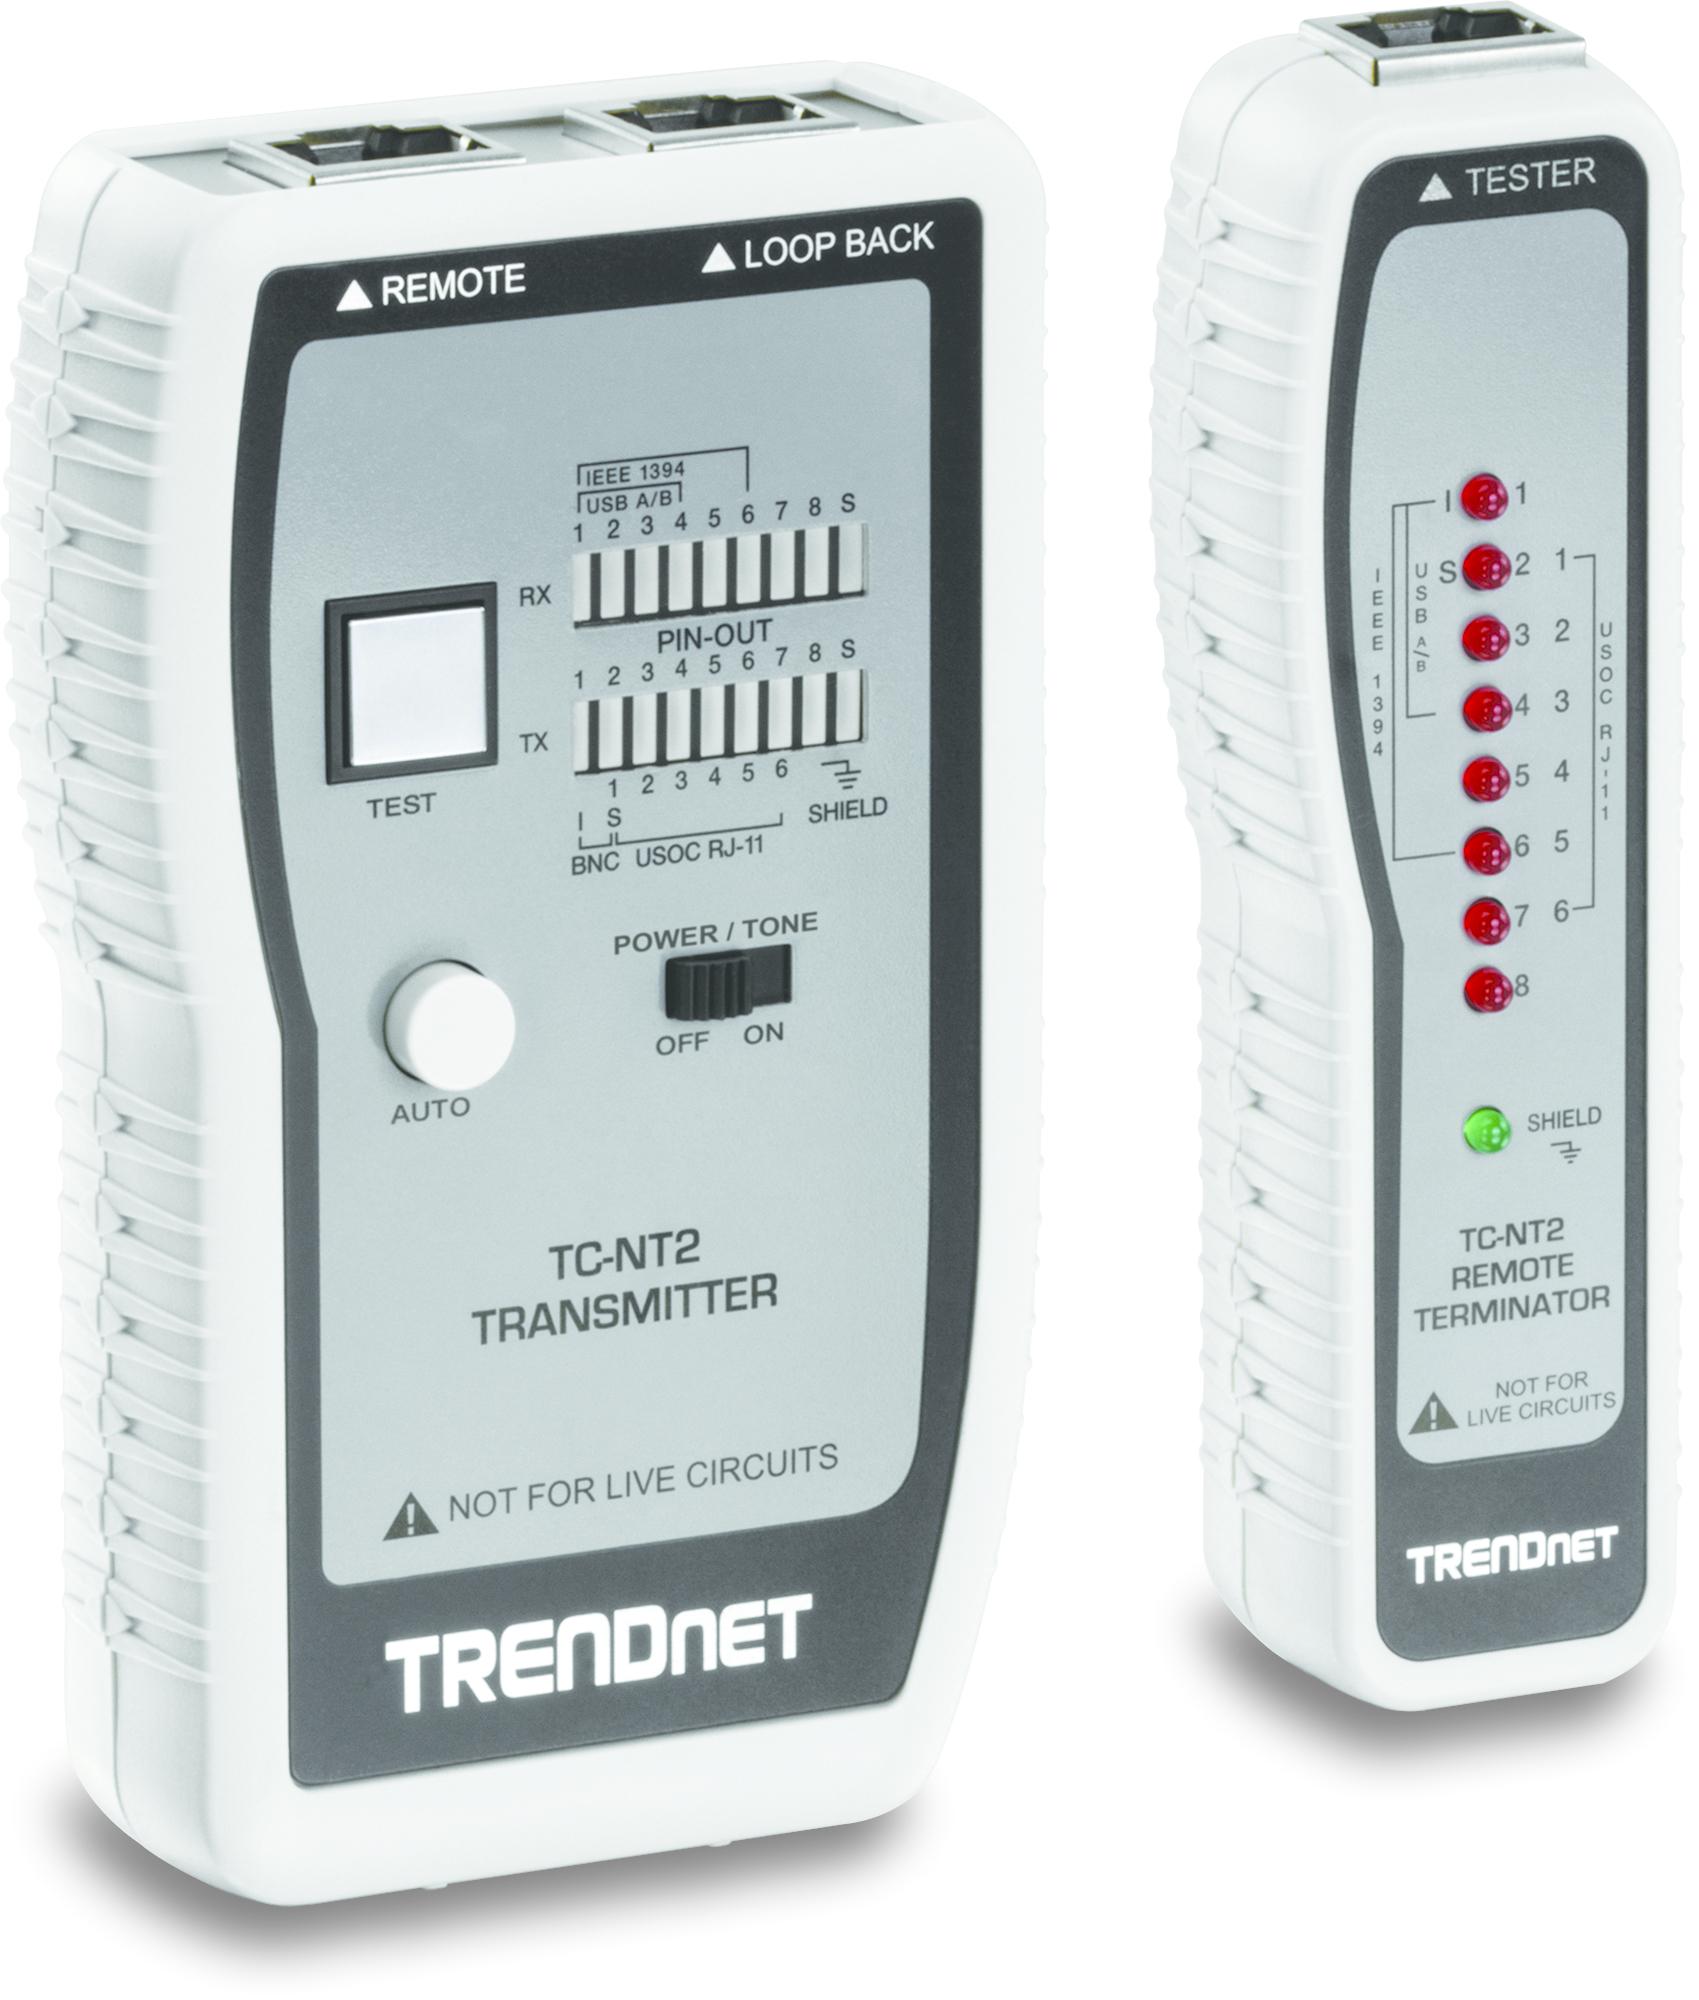 Trendnet TC-NT2 network analyzer